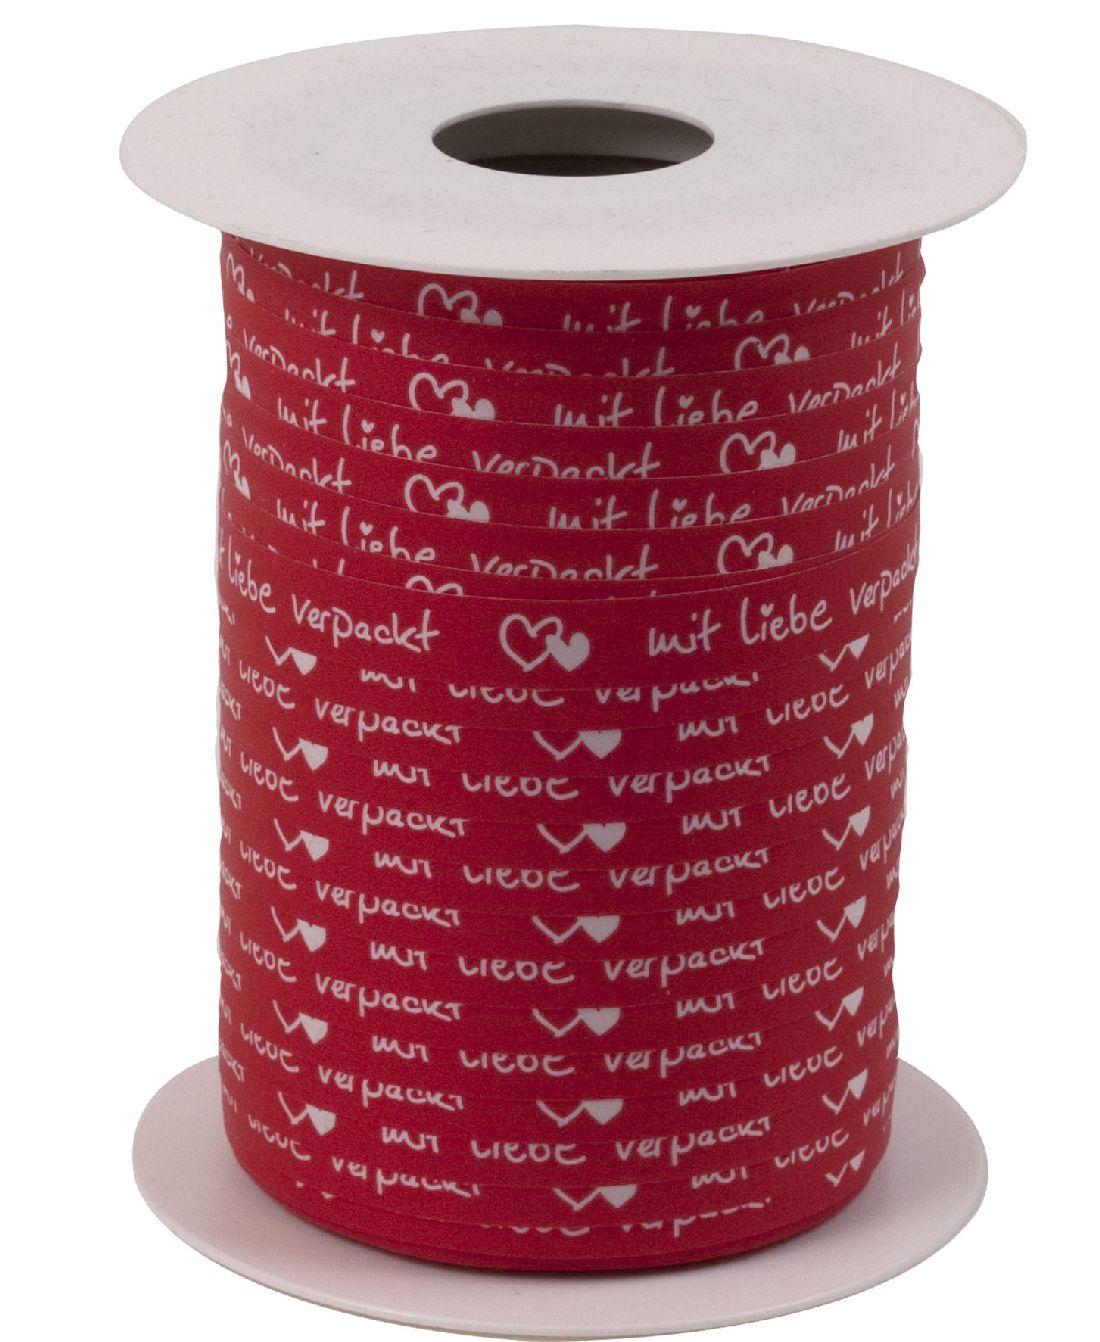 Polyband Mit Liebe verpackt ROT 8169 Ringelband 10mm  150Meter Ziehband